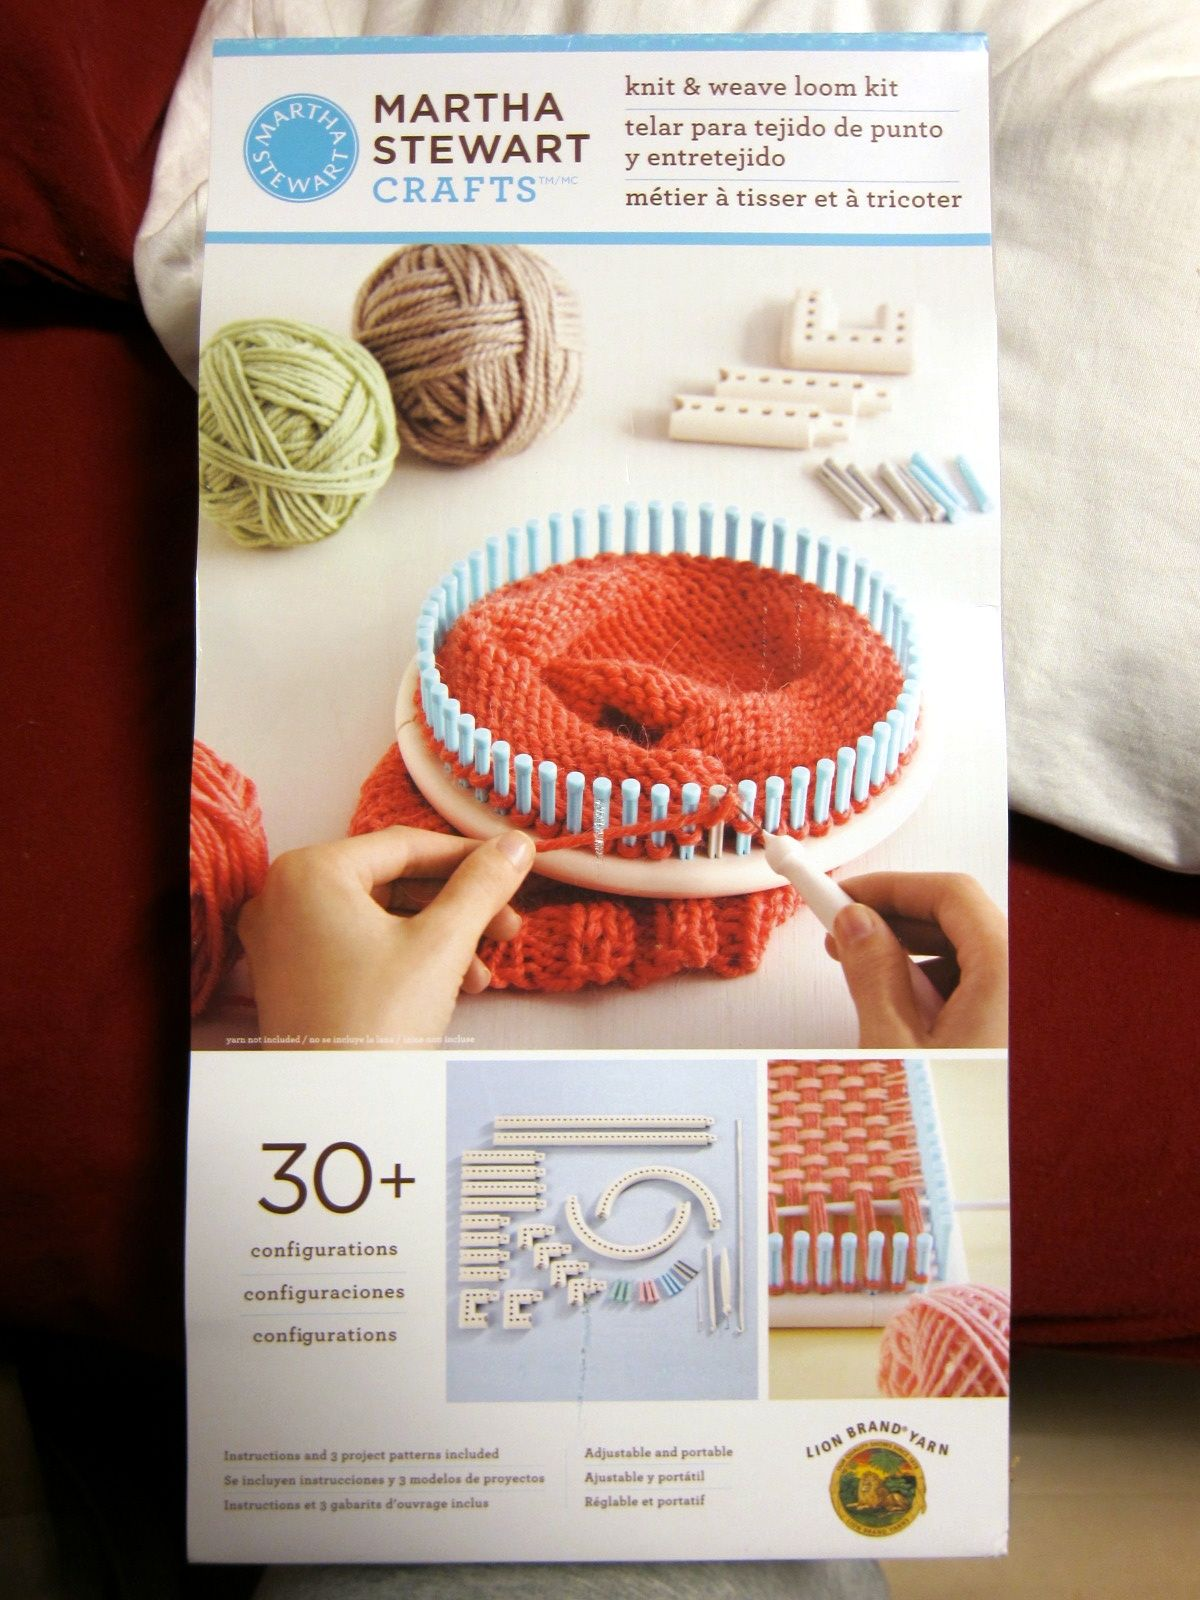 martha stewart knitting loom patterns. I just got this and love it ...